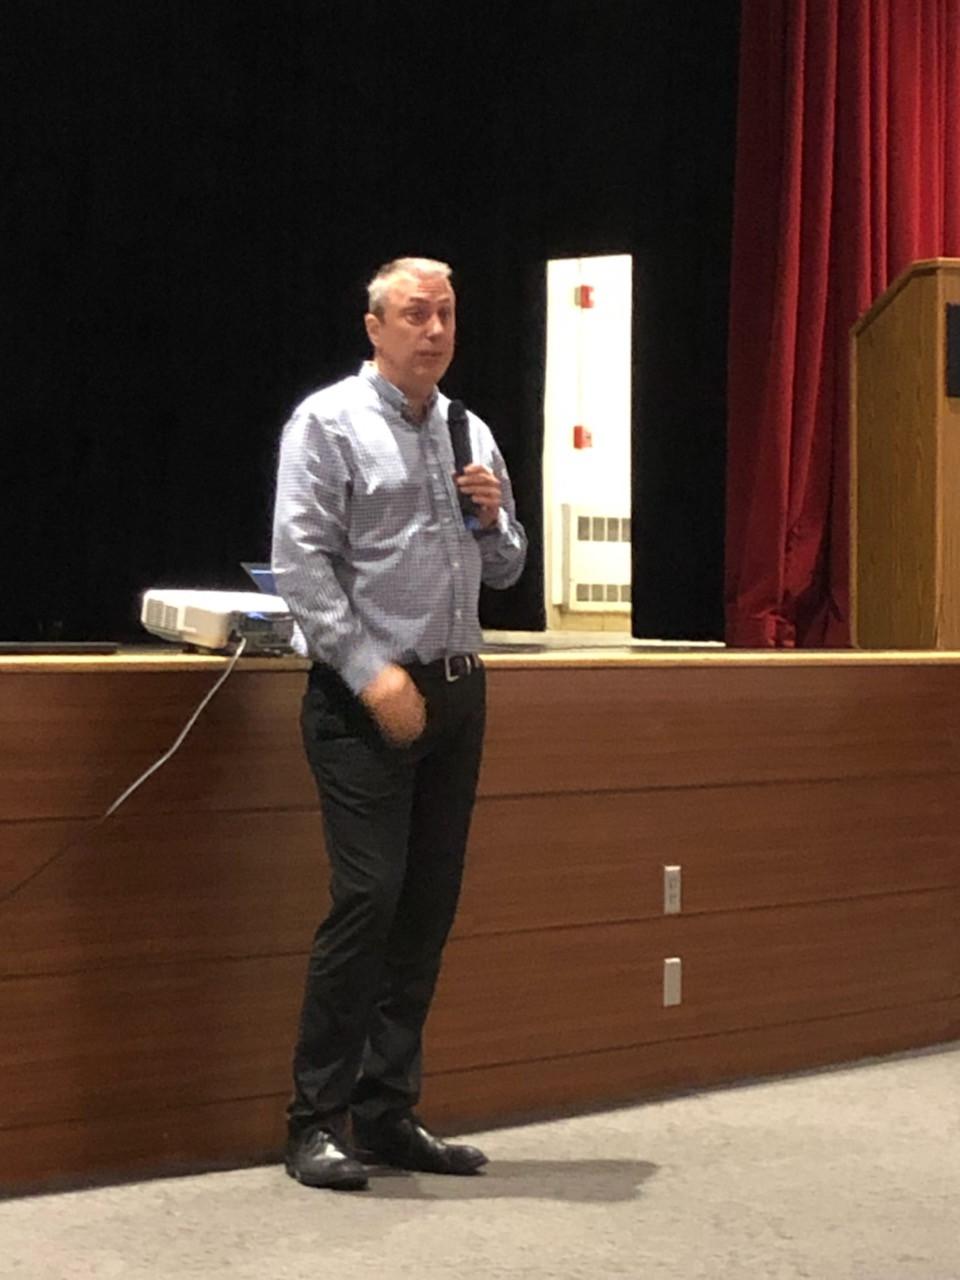 Michel Segers speaking to CTE students